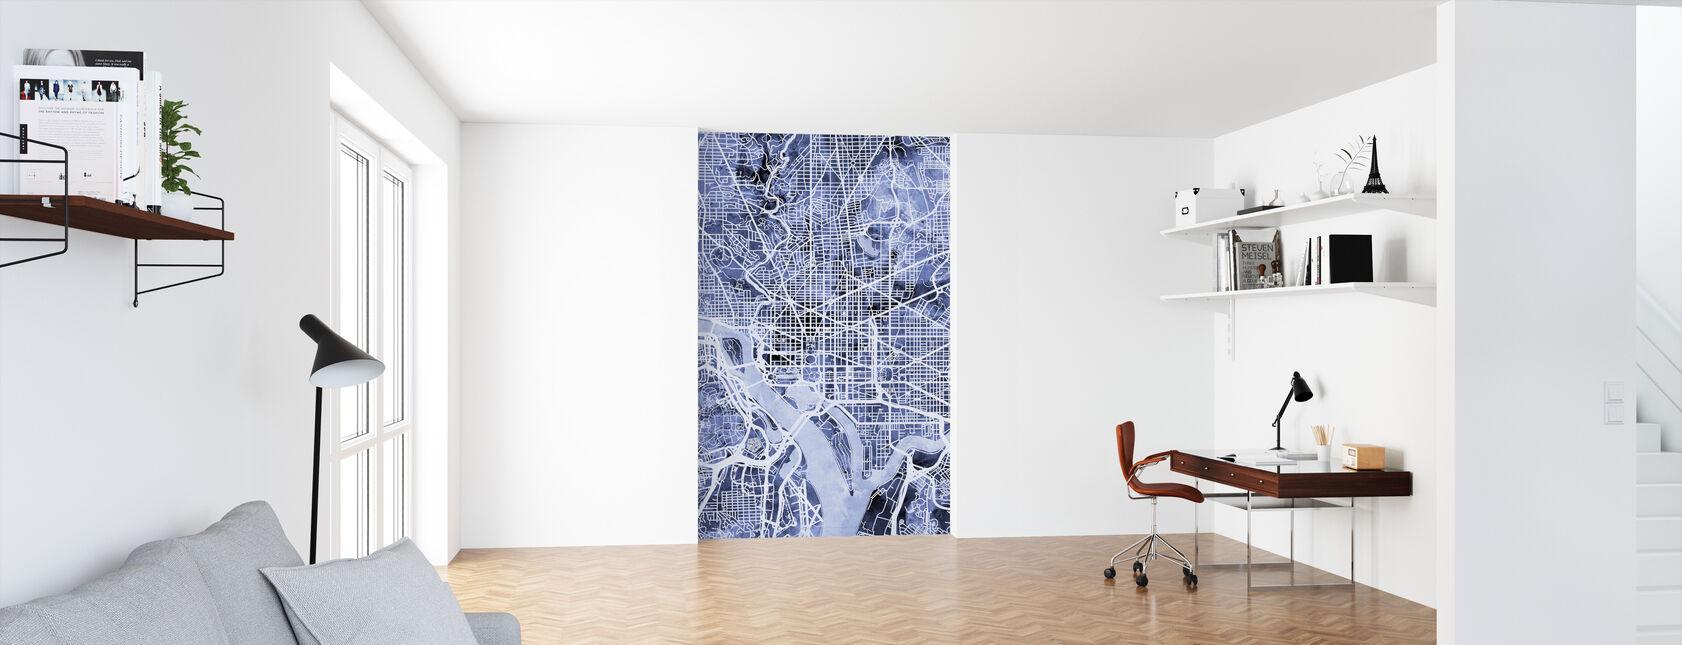 Washington DC Street Map - Wallpaper - Office